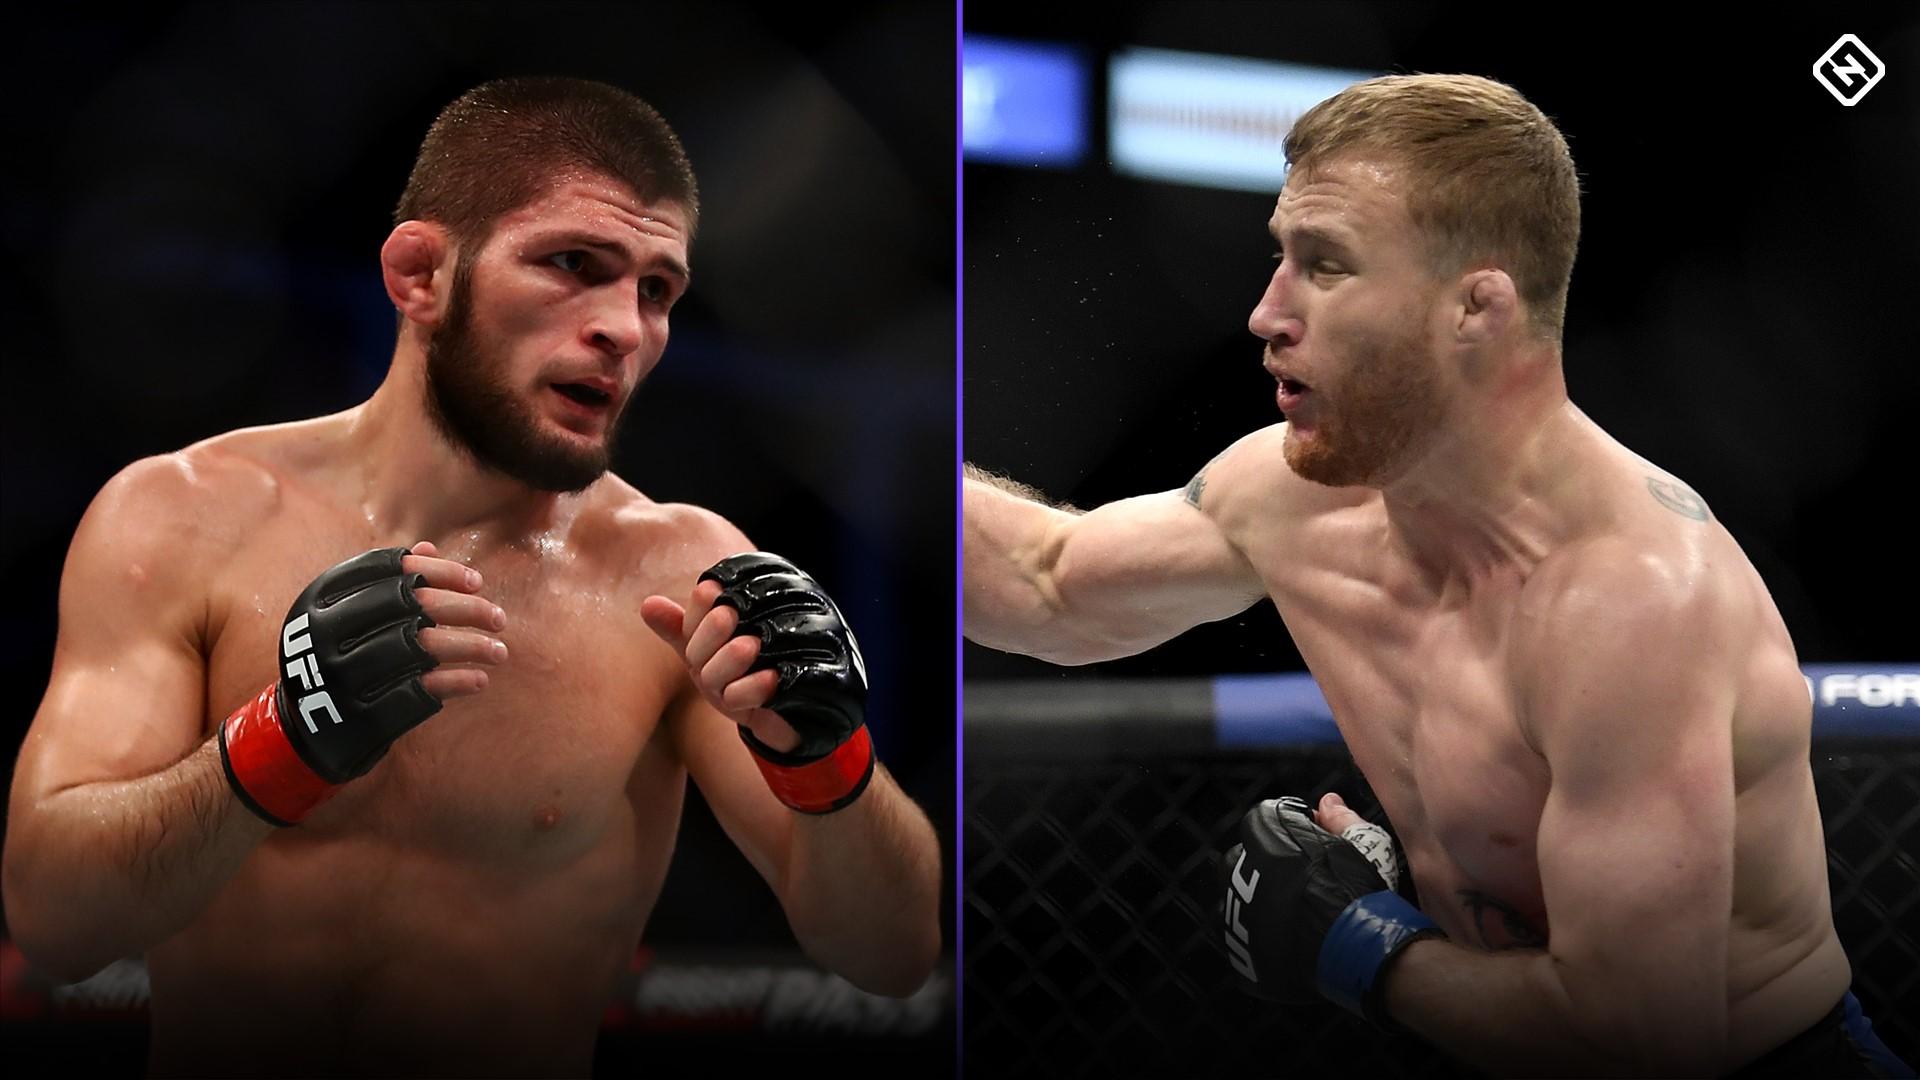 Khabib Nurmagomedov vs. Justin Gaethje purse, salaries: How much money will they make at UFC 254?